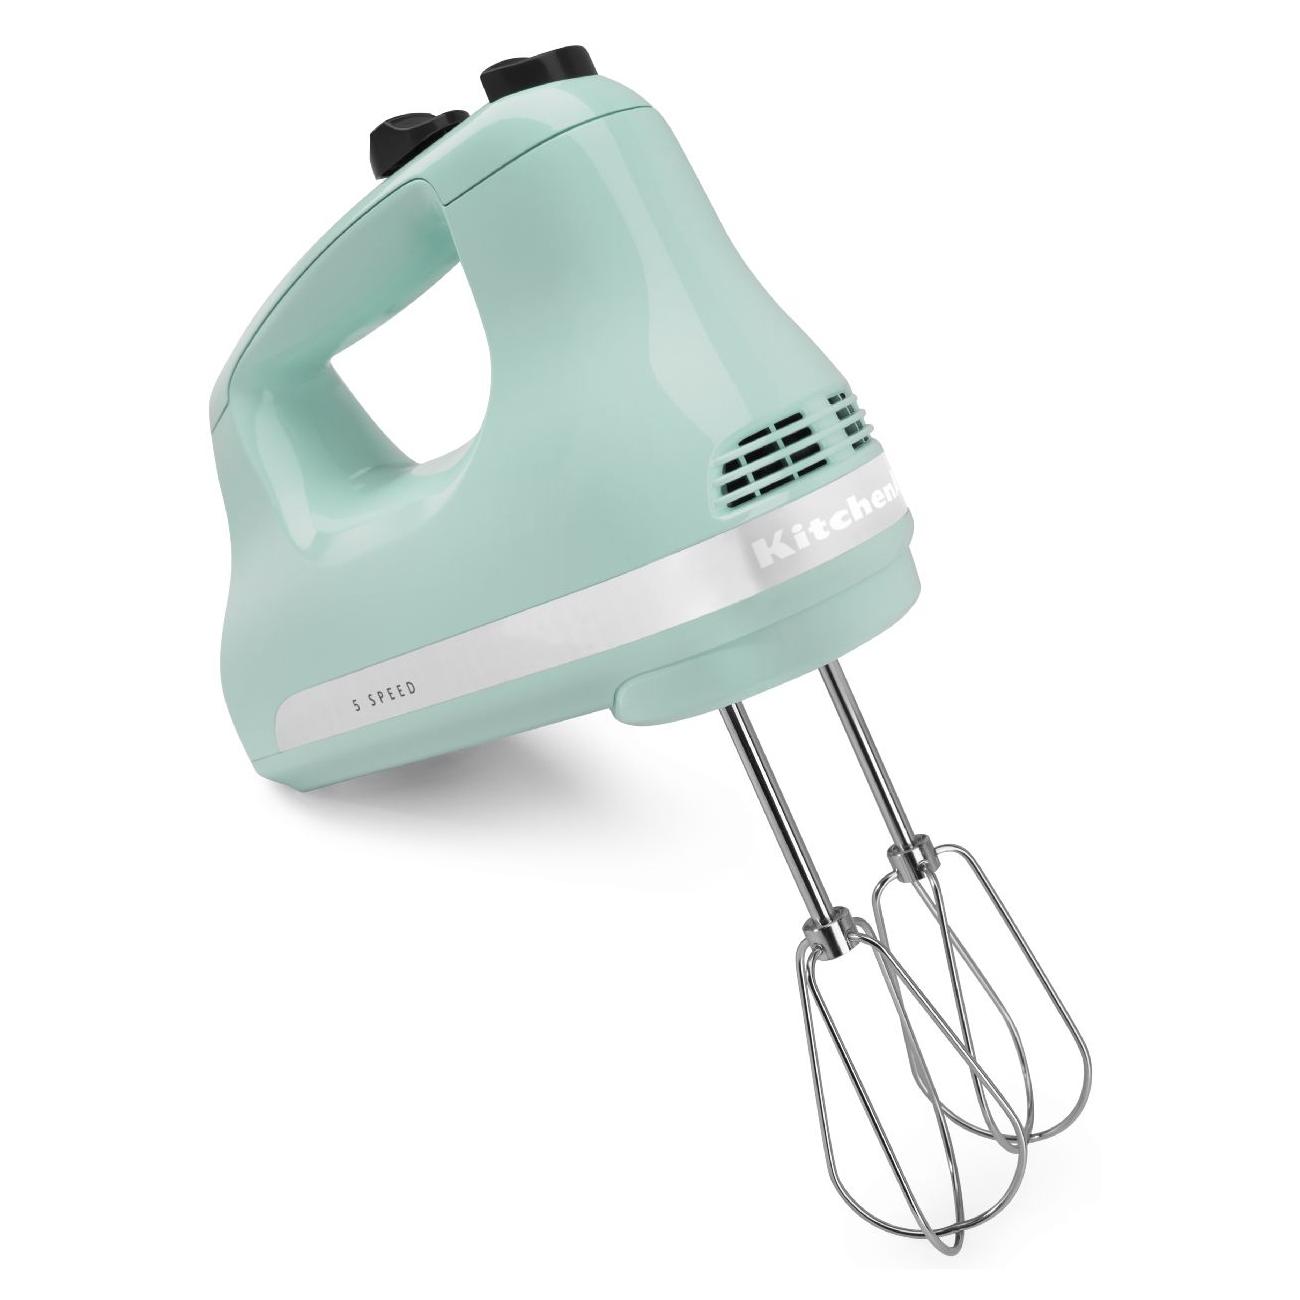 KitchenAid Ultra Power Ice Blue 5-Speed Hand Mixer